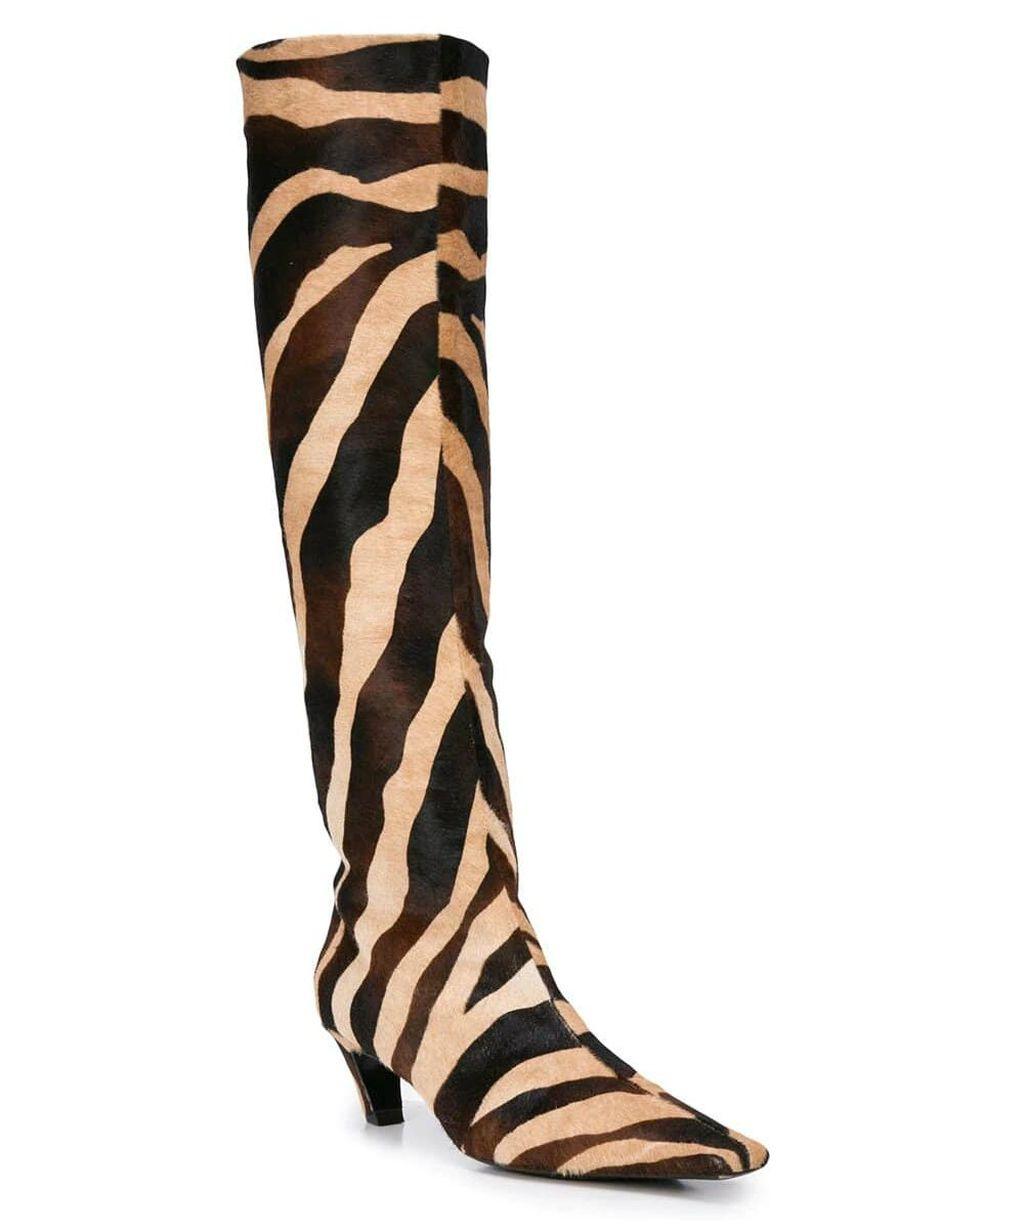 Čizme brenda Khaite, 1800 dolara